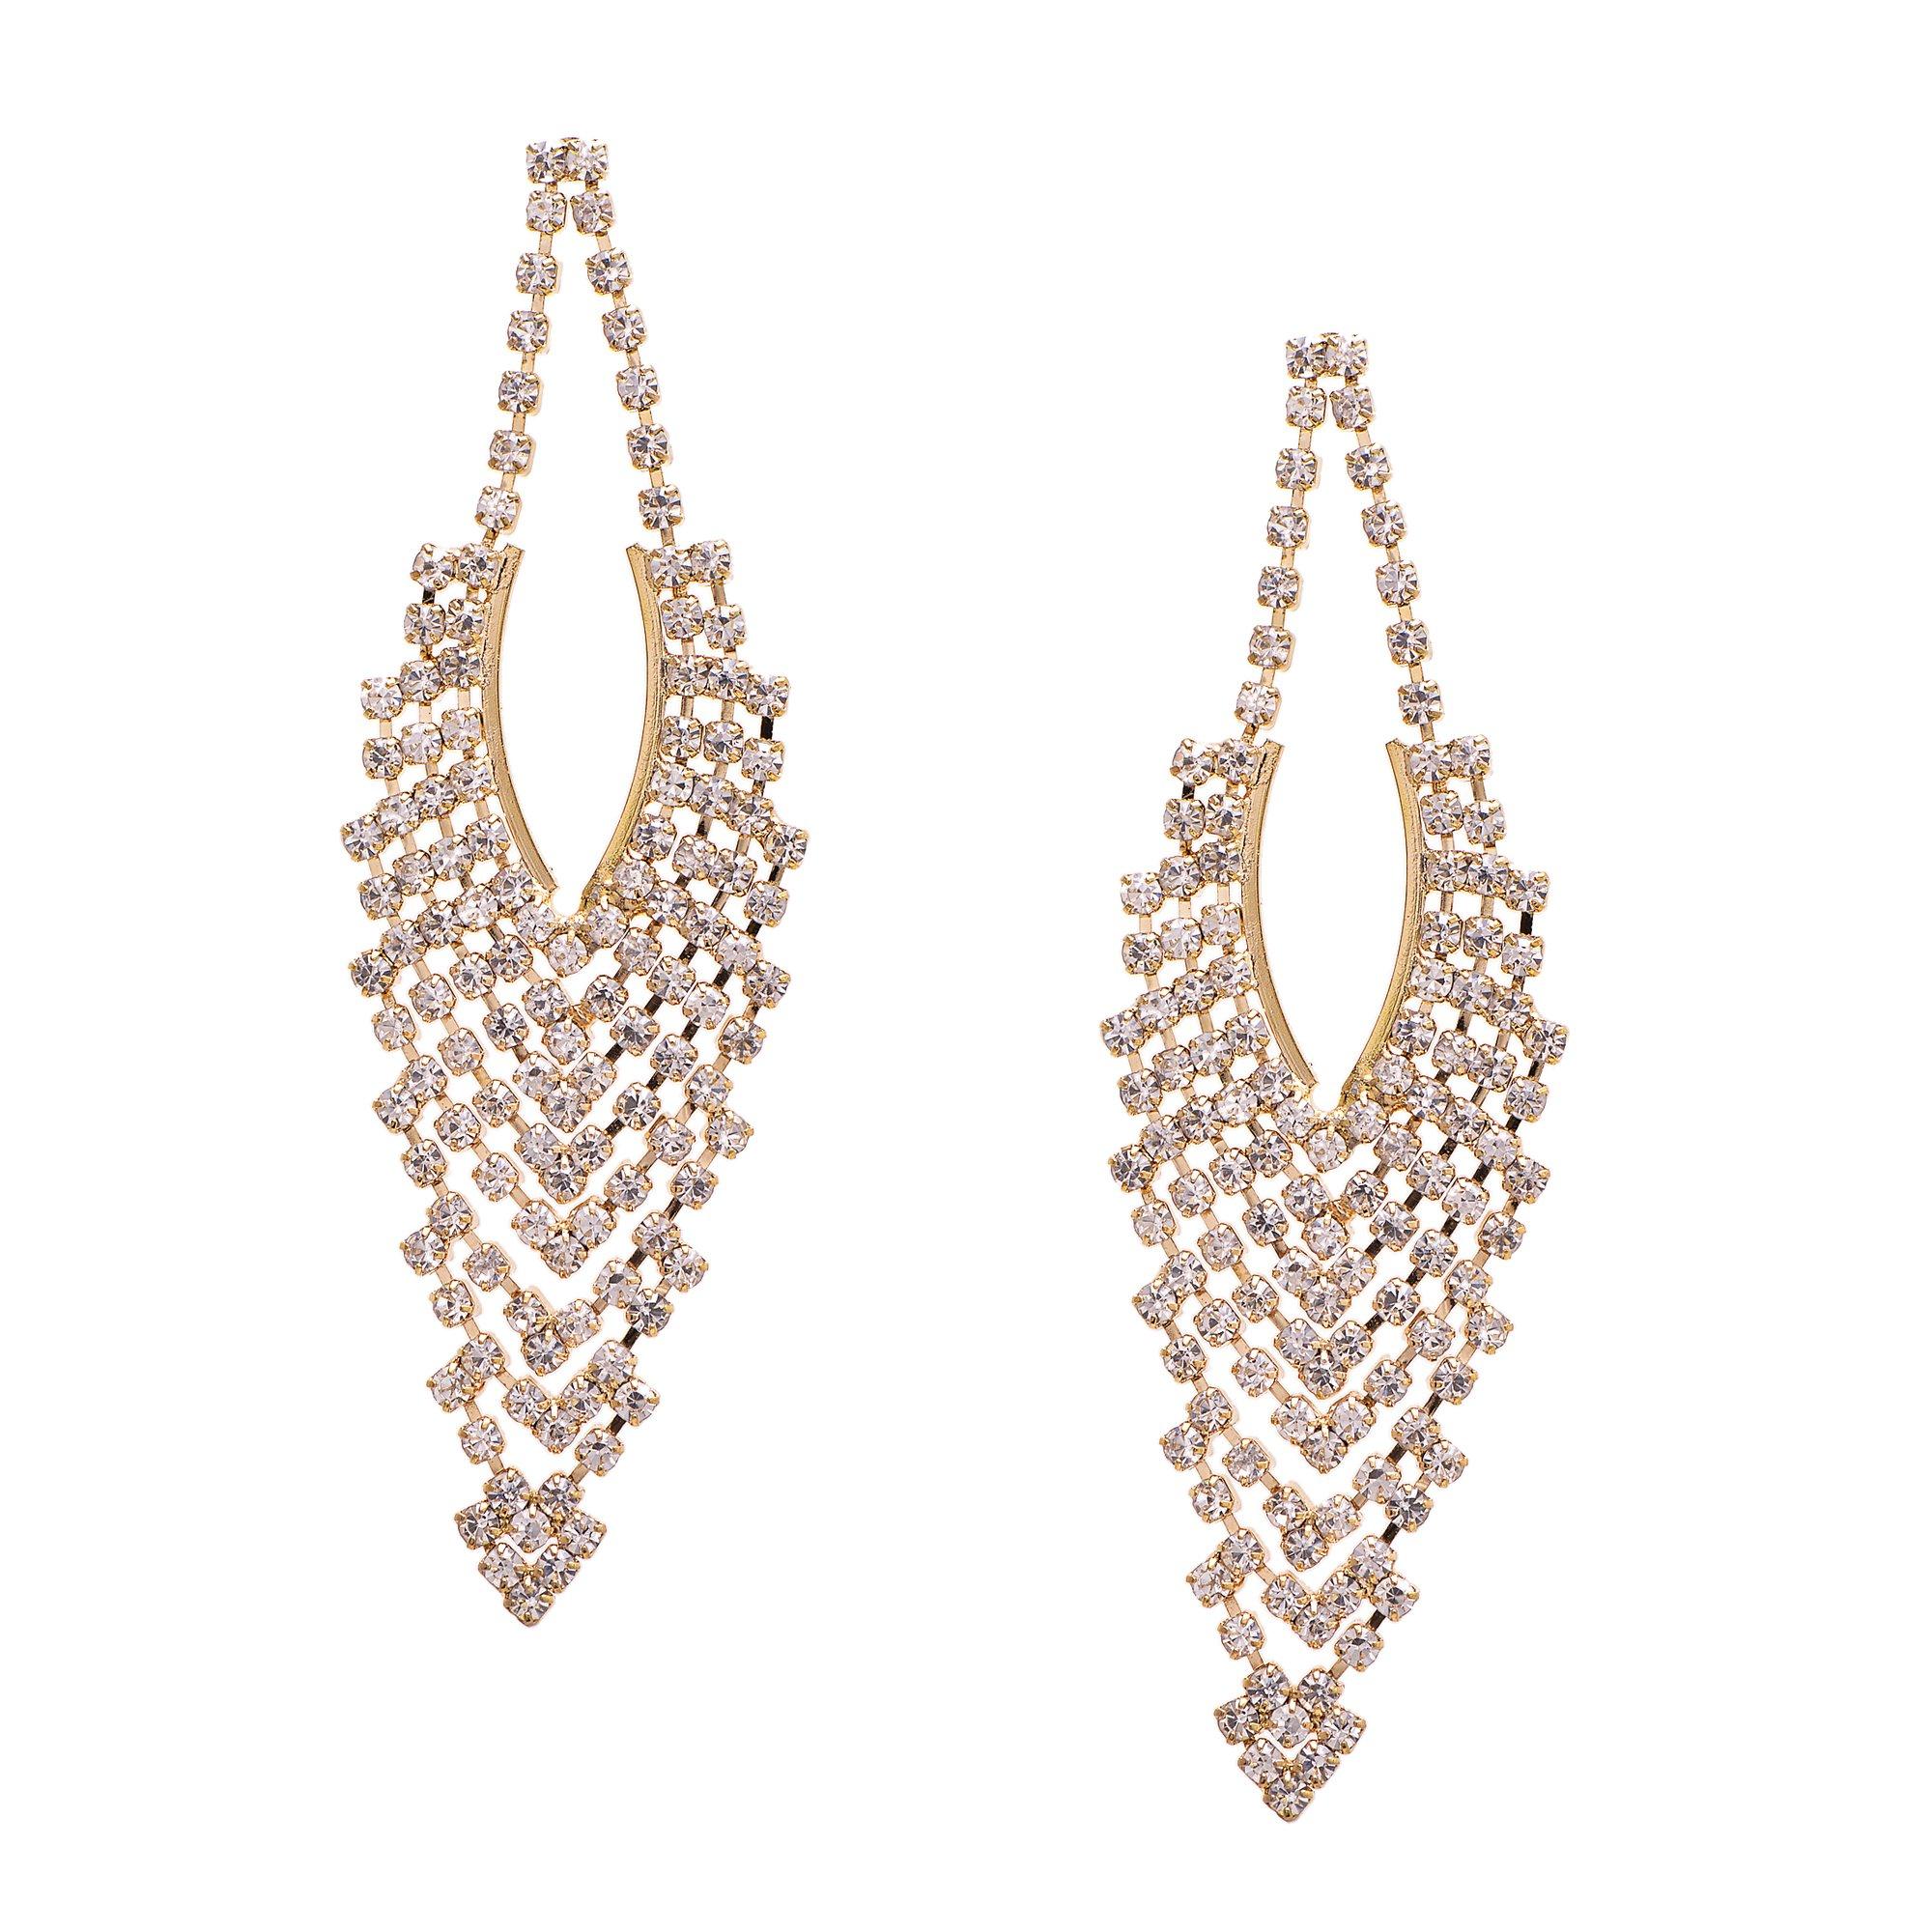 Spinningdaisy Vintage Style Rhinestone Dangling Chandelier Earrings (Gold)